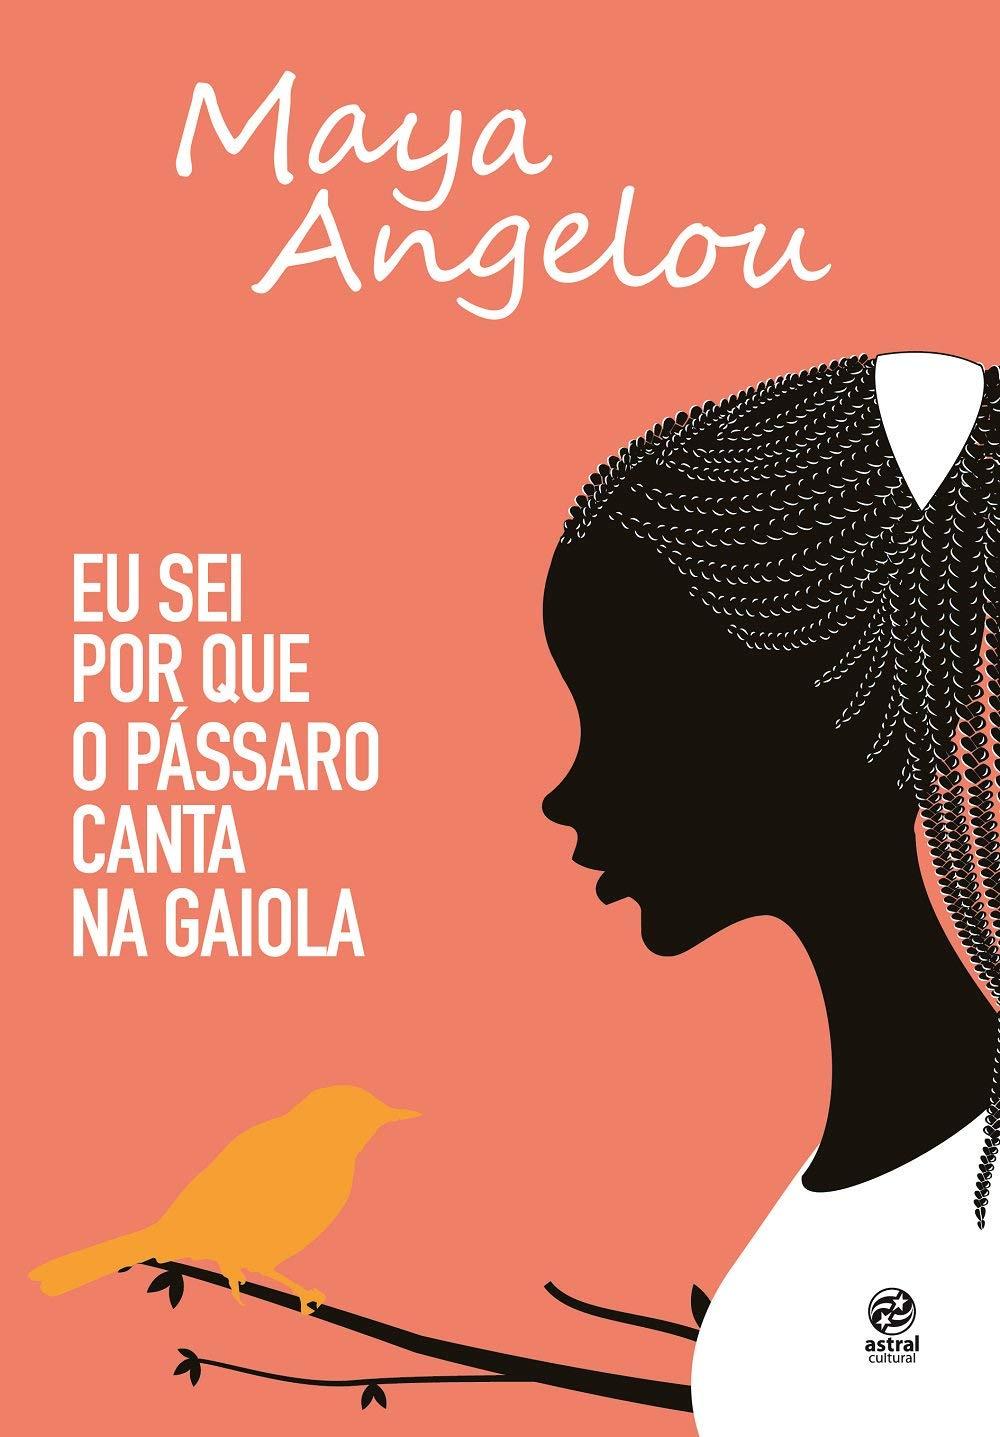 Eu sei por que o pássaro canta na gaiola, livro de Maya Angelou